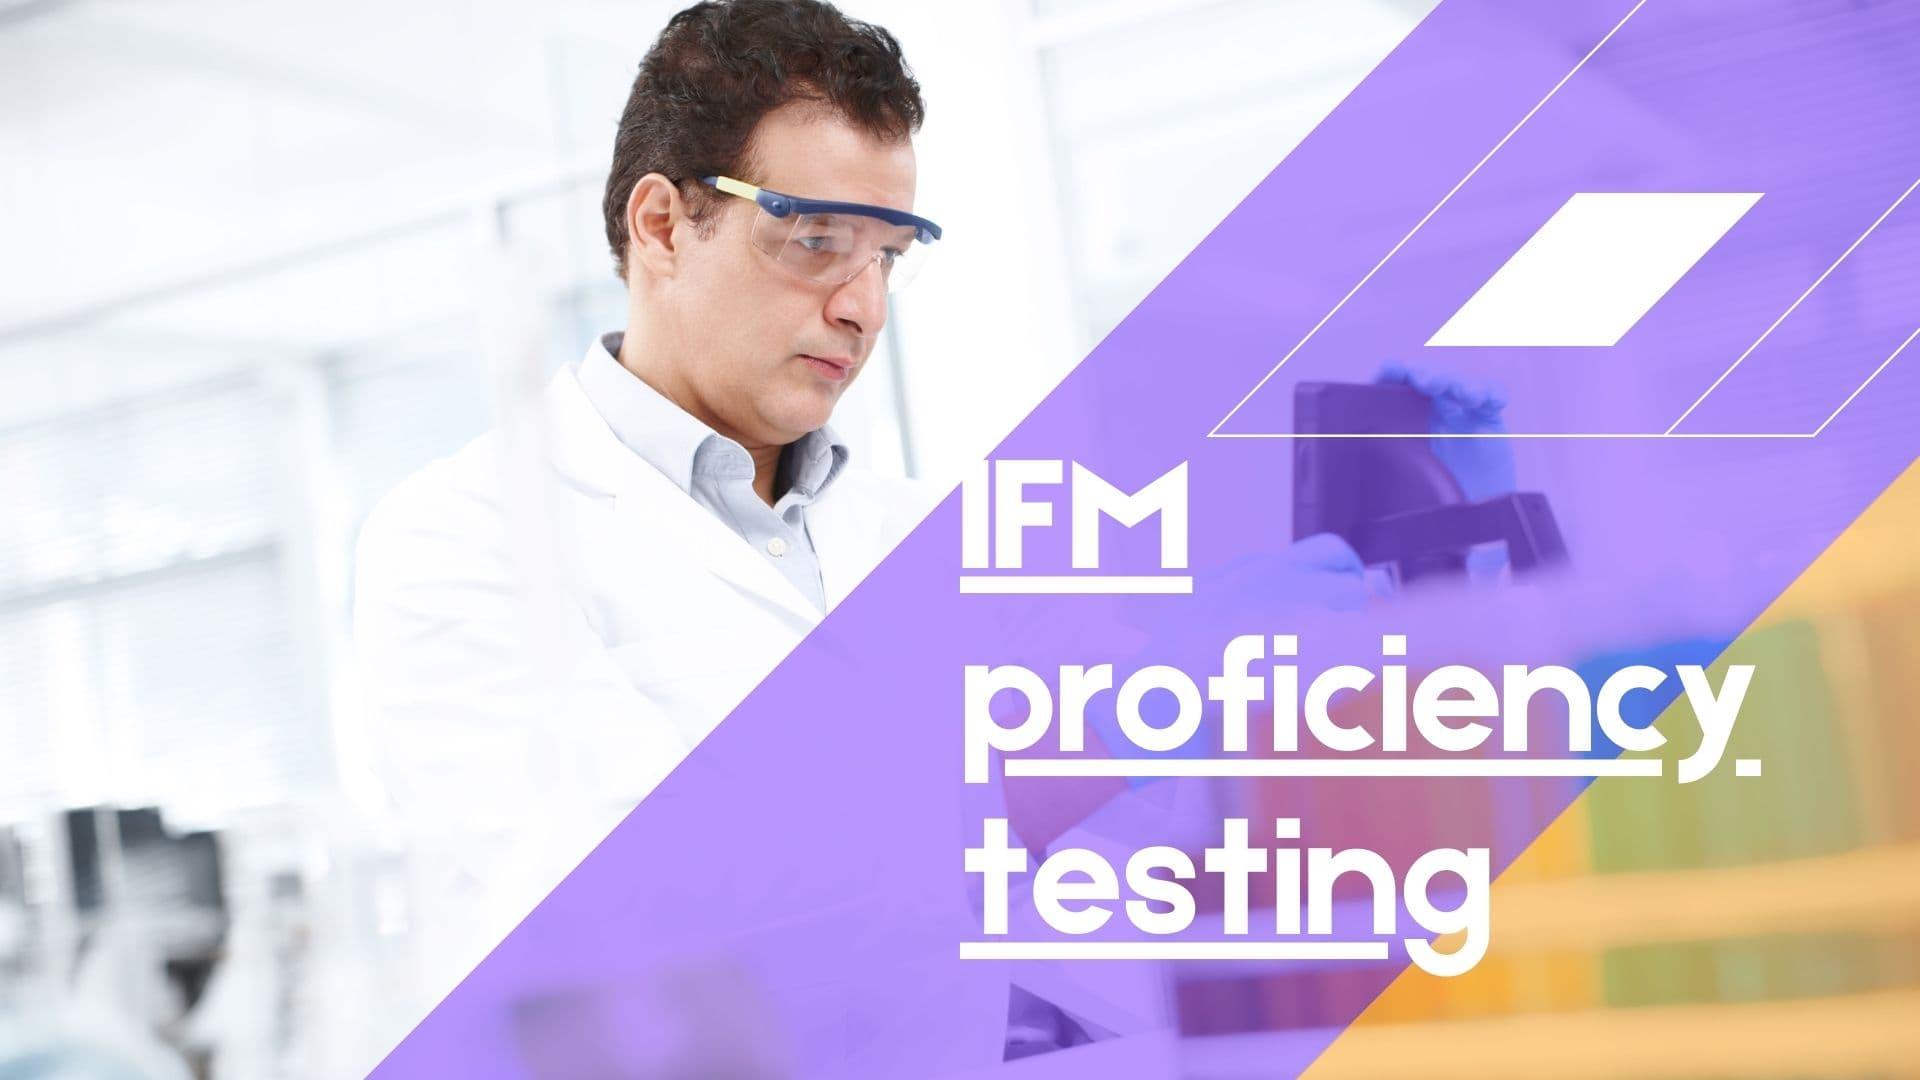 IFM proficiency testing